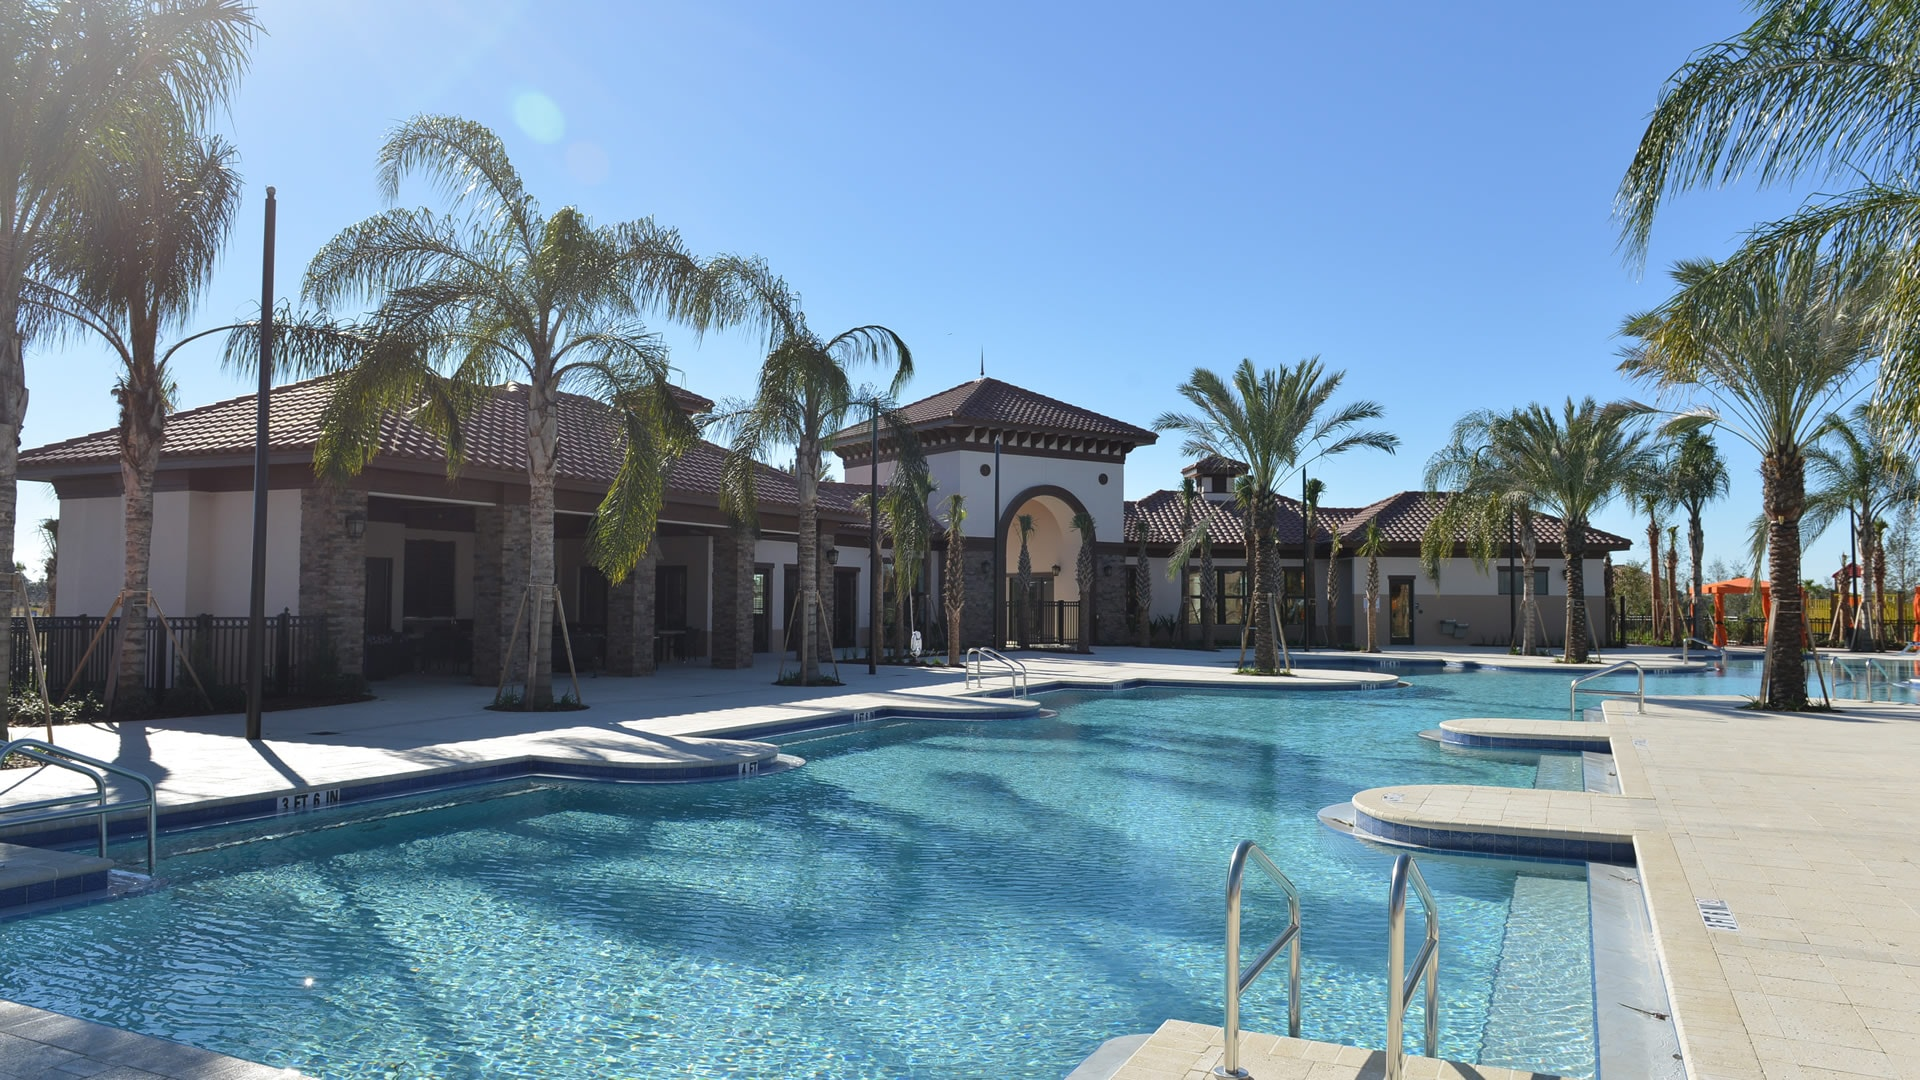 Communal Pool at Solterra Resort